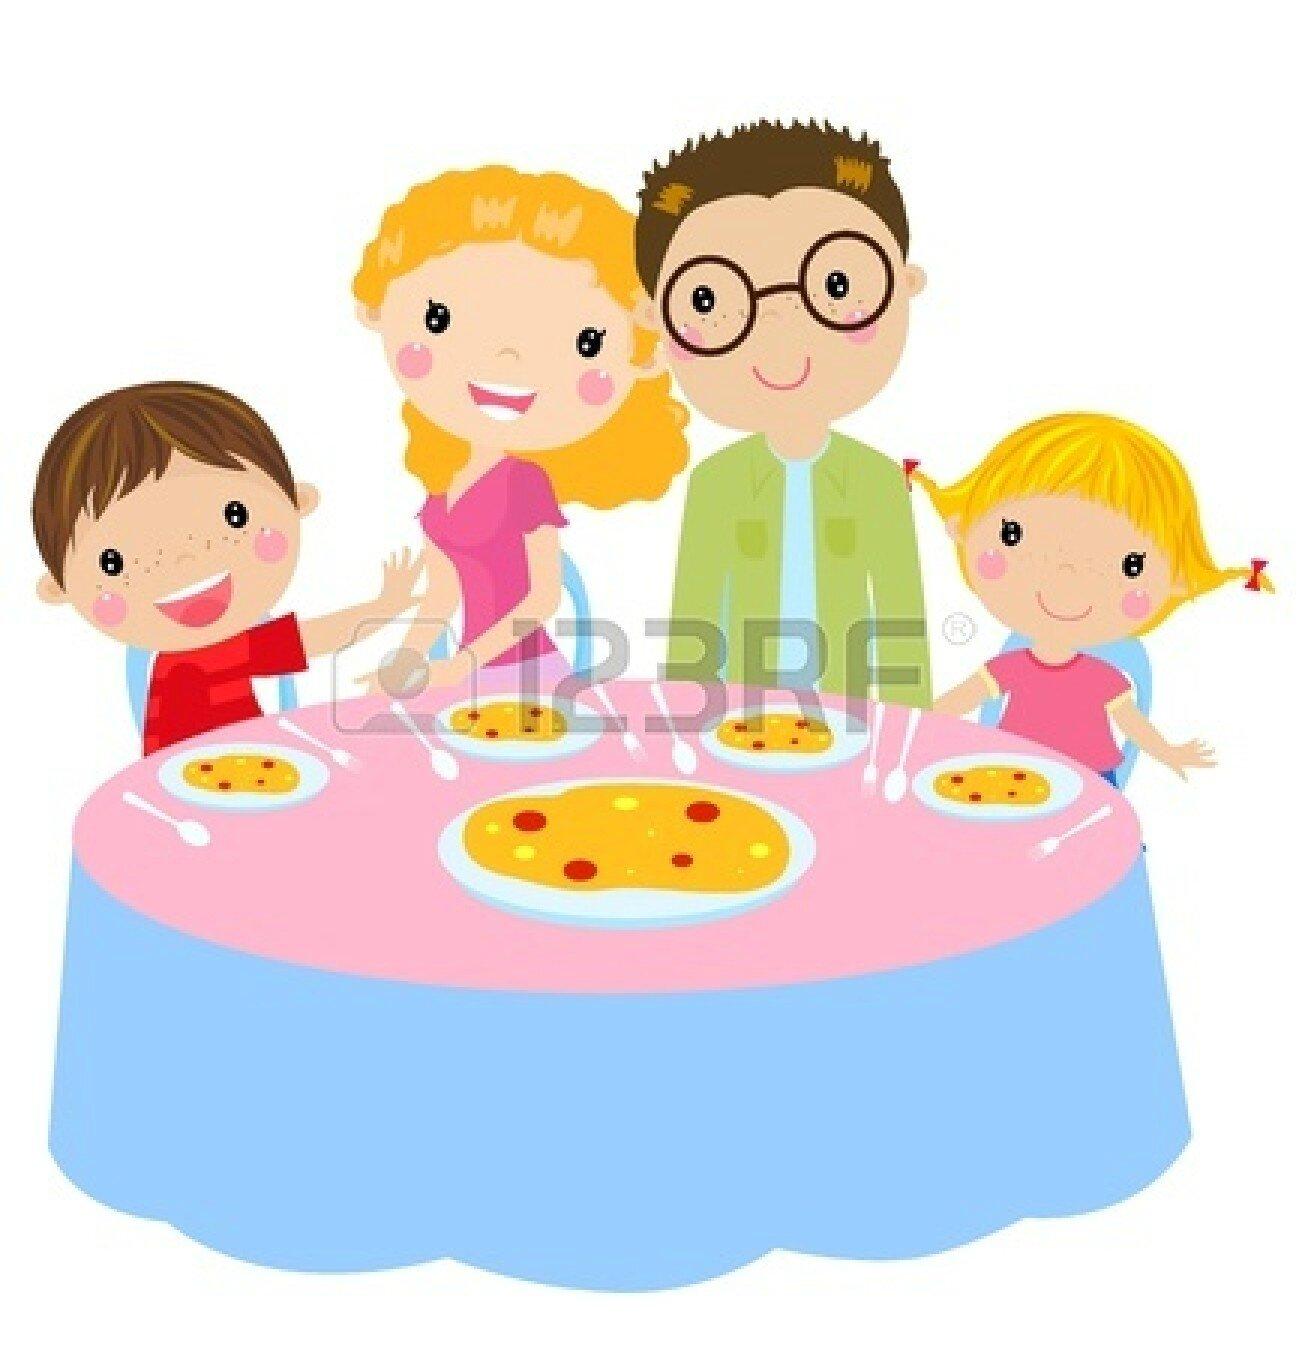 clipart family dinner table - photo #23